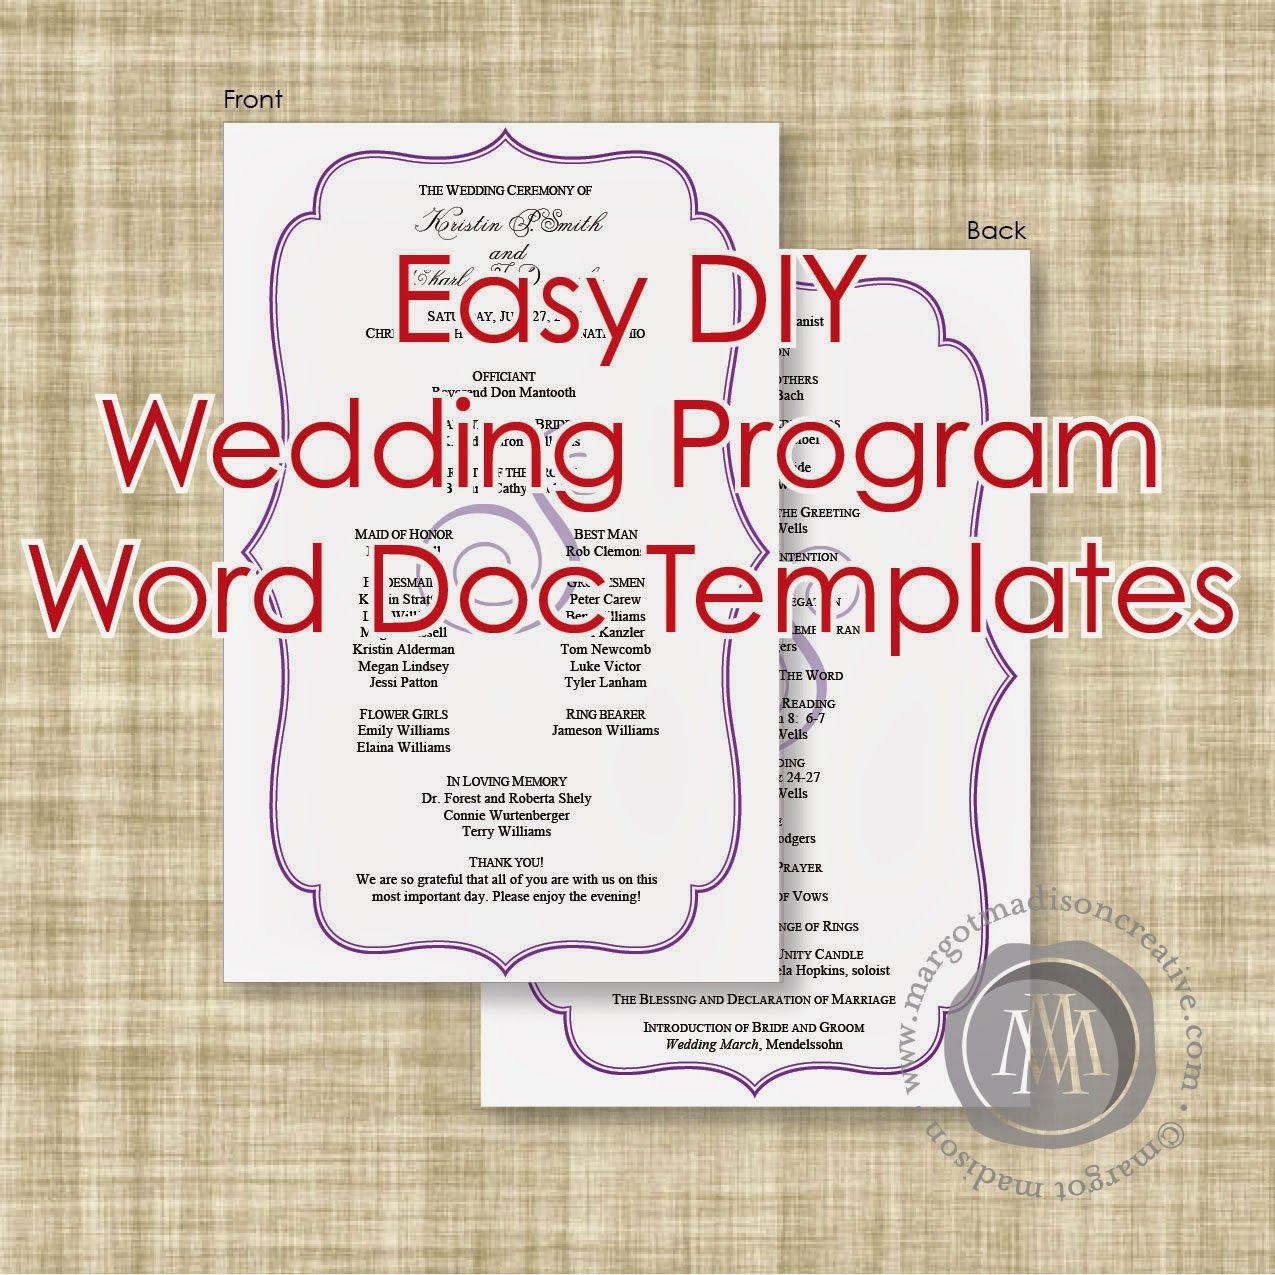 004 Imposing Wedding Program Template Word Picture  Catholic Mas Sample Wording Idea Example SimpleFull